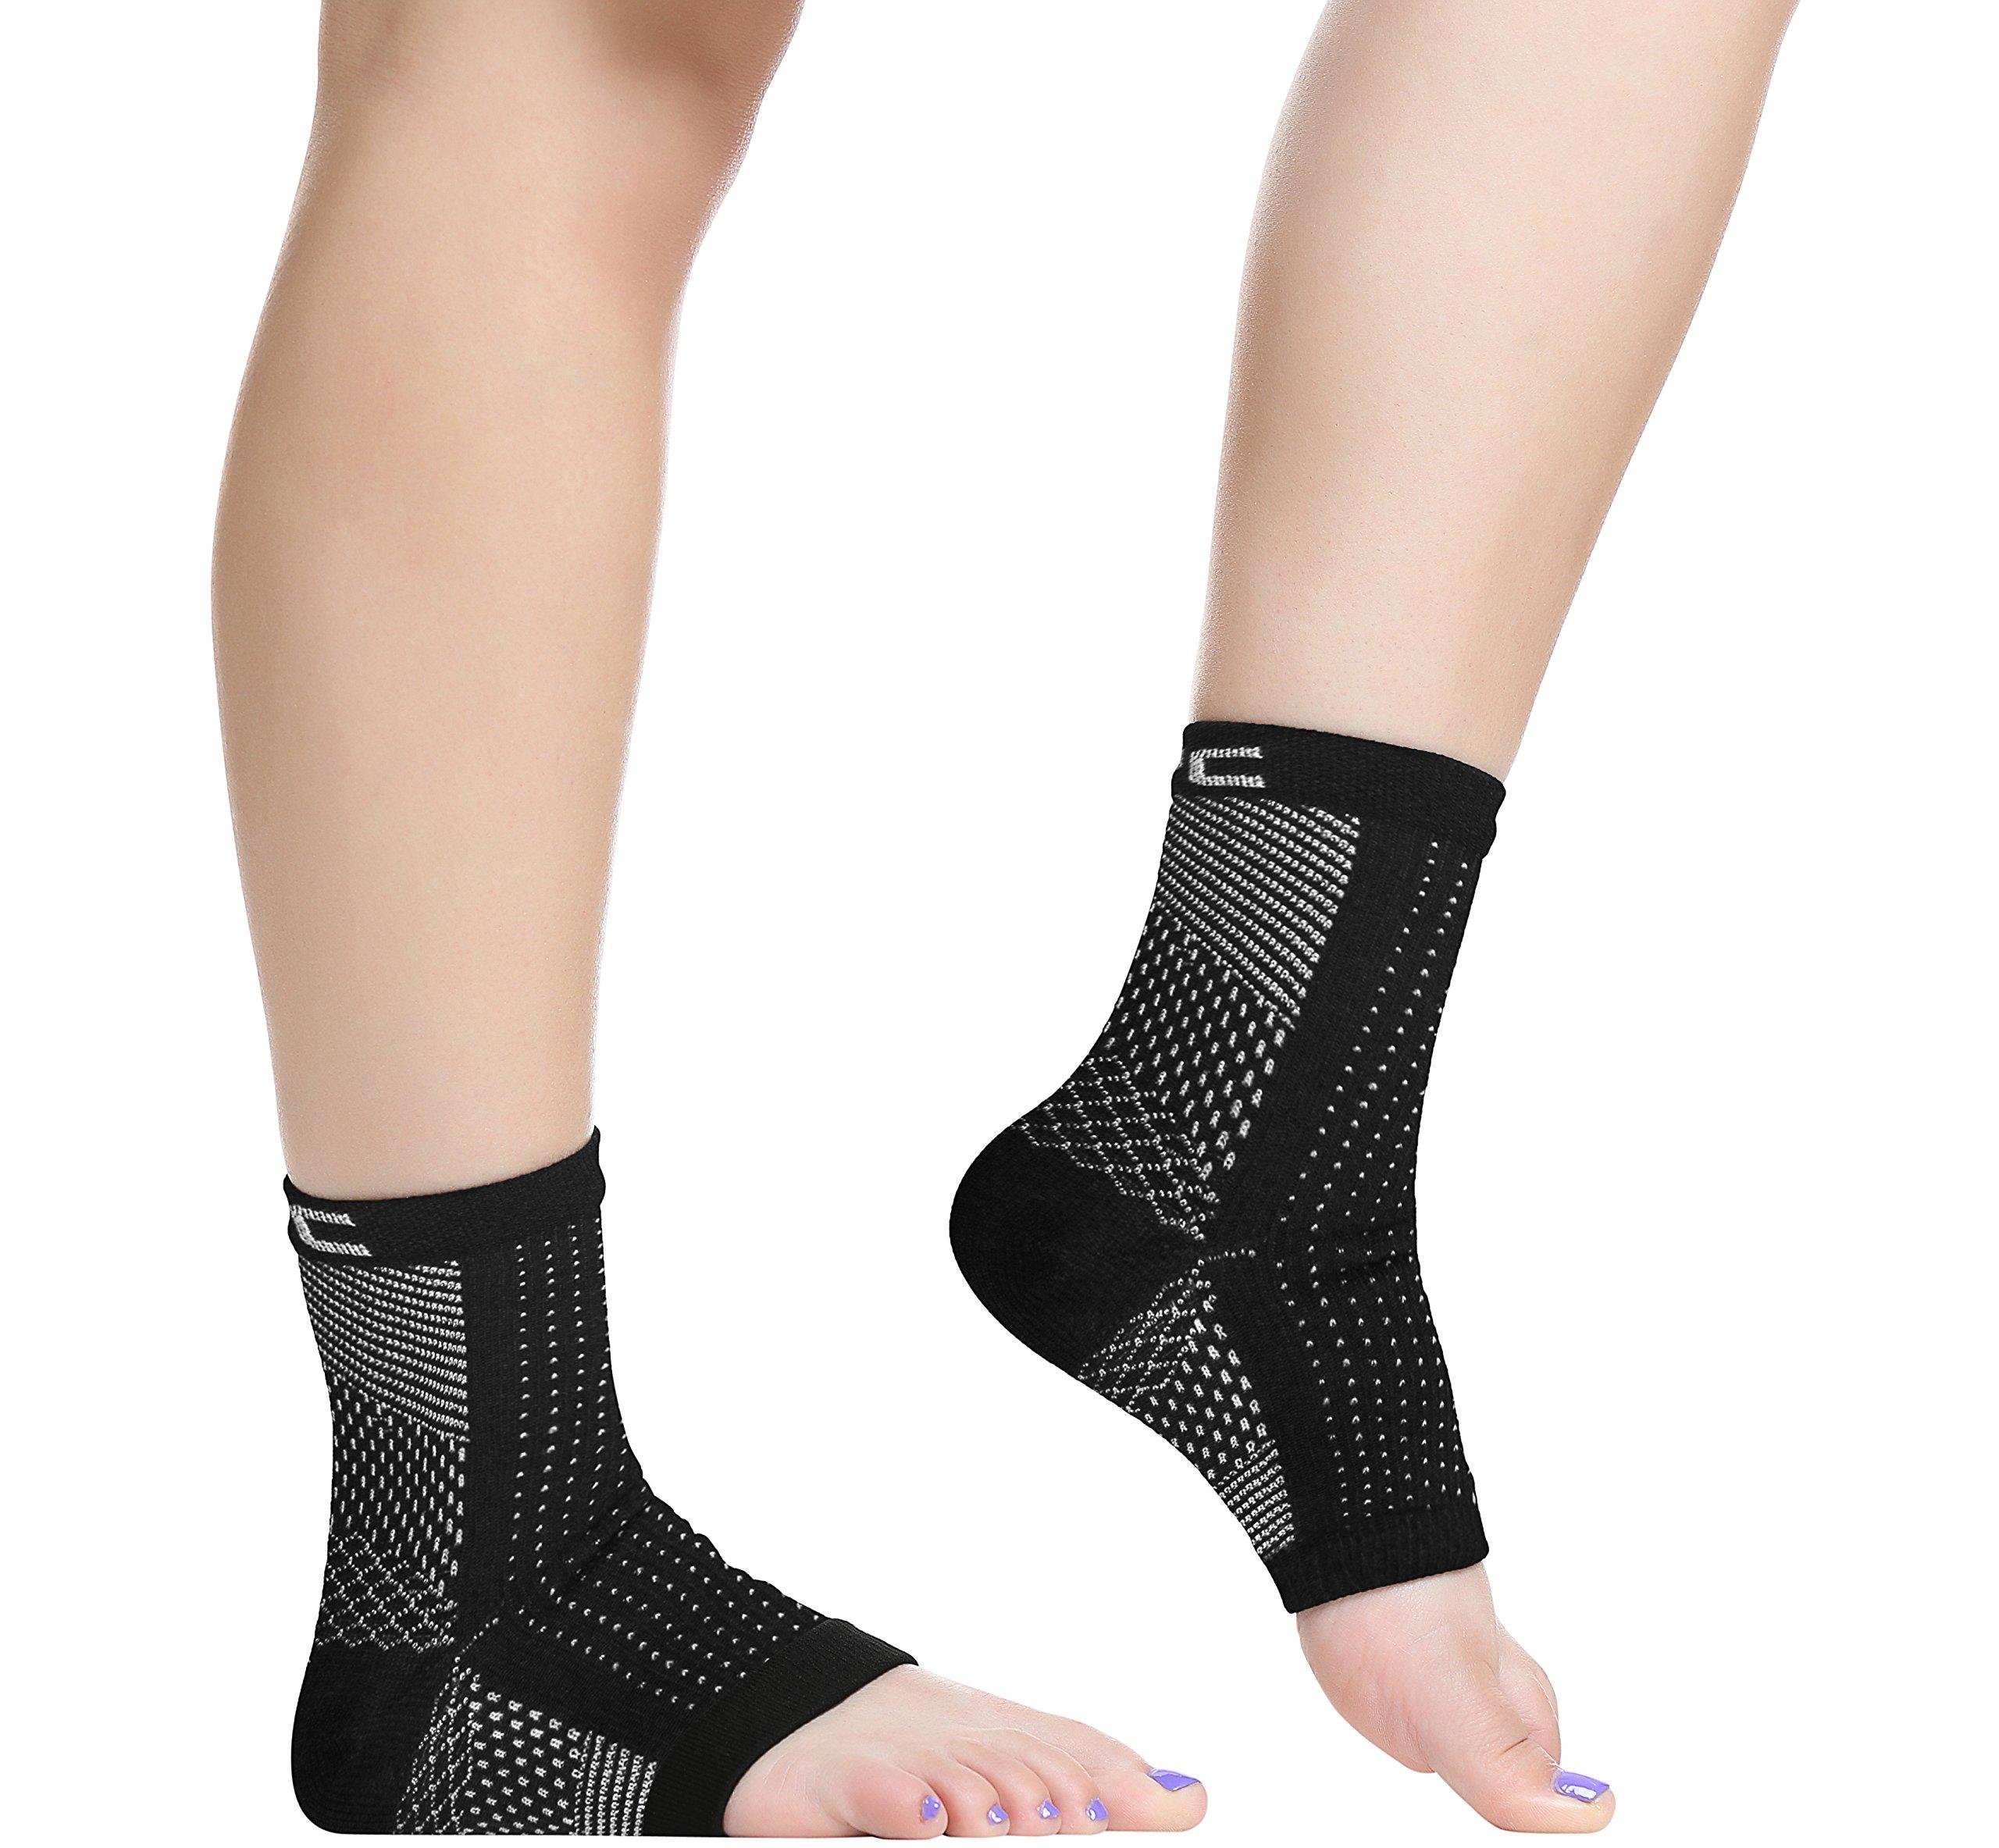 Best Orthotics for Knee Pain: Amazon.com